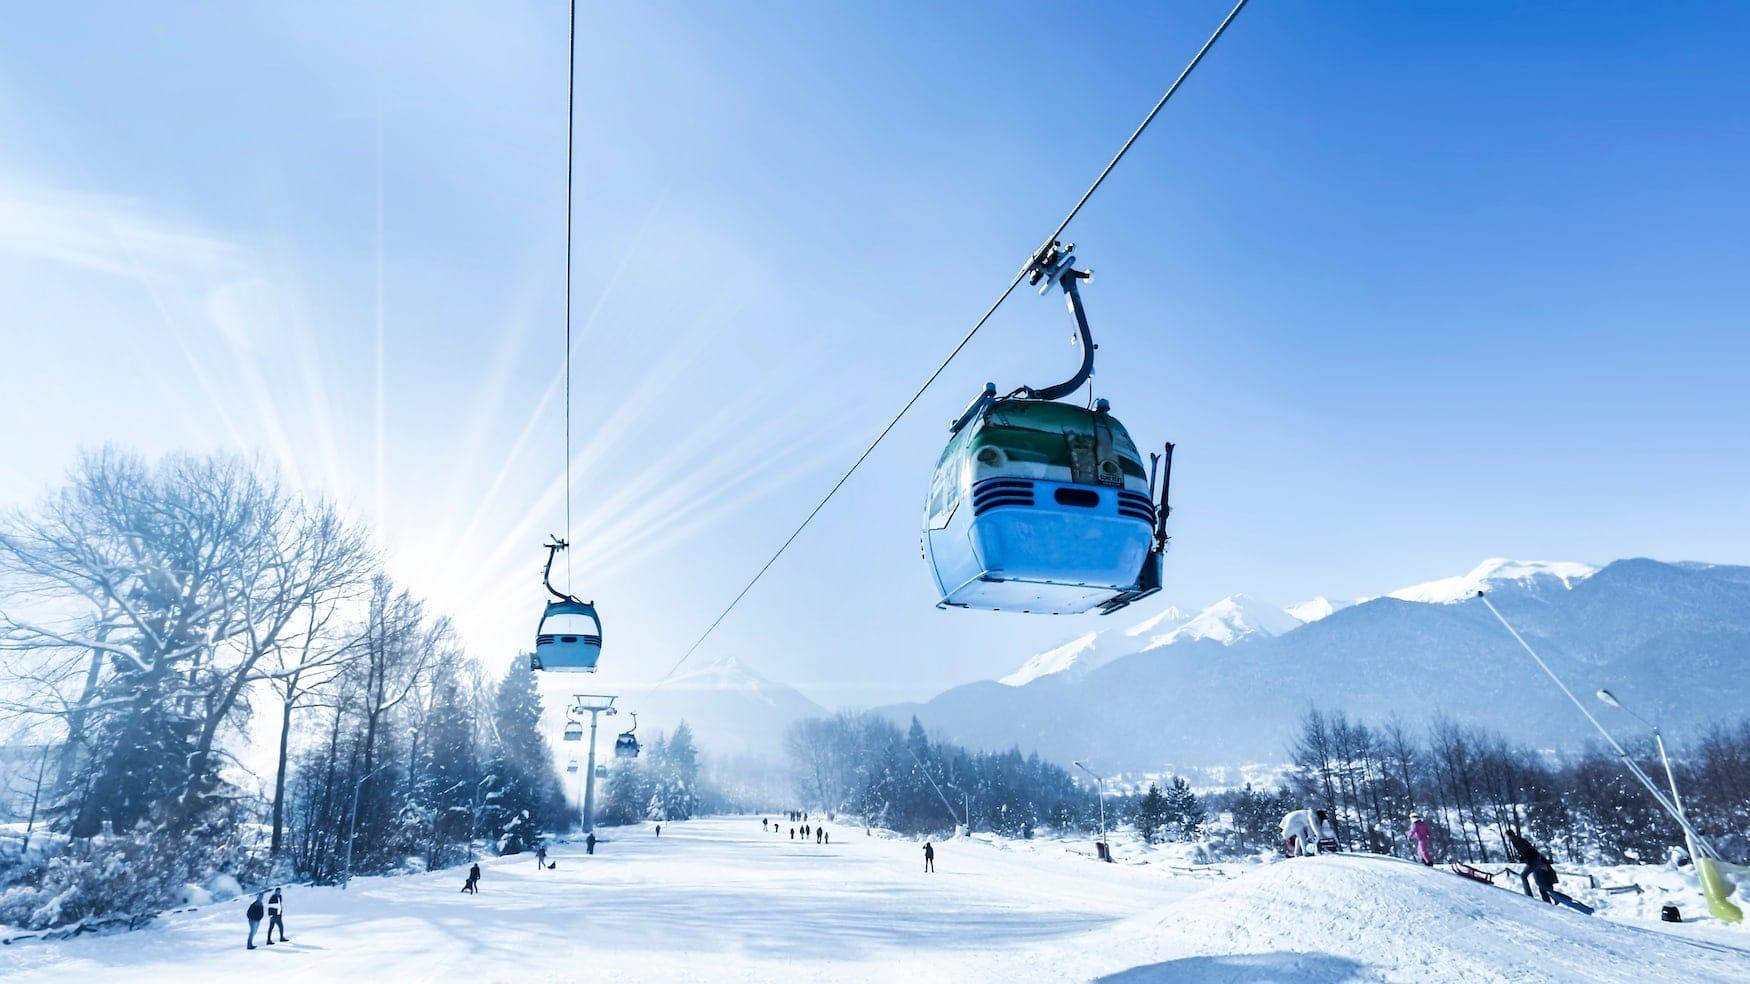 Skigondeln in bulgarischem Skigebiet Bansko